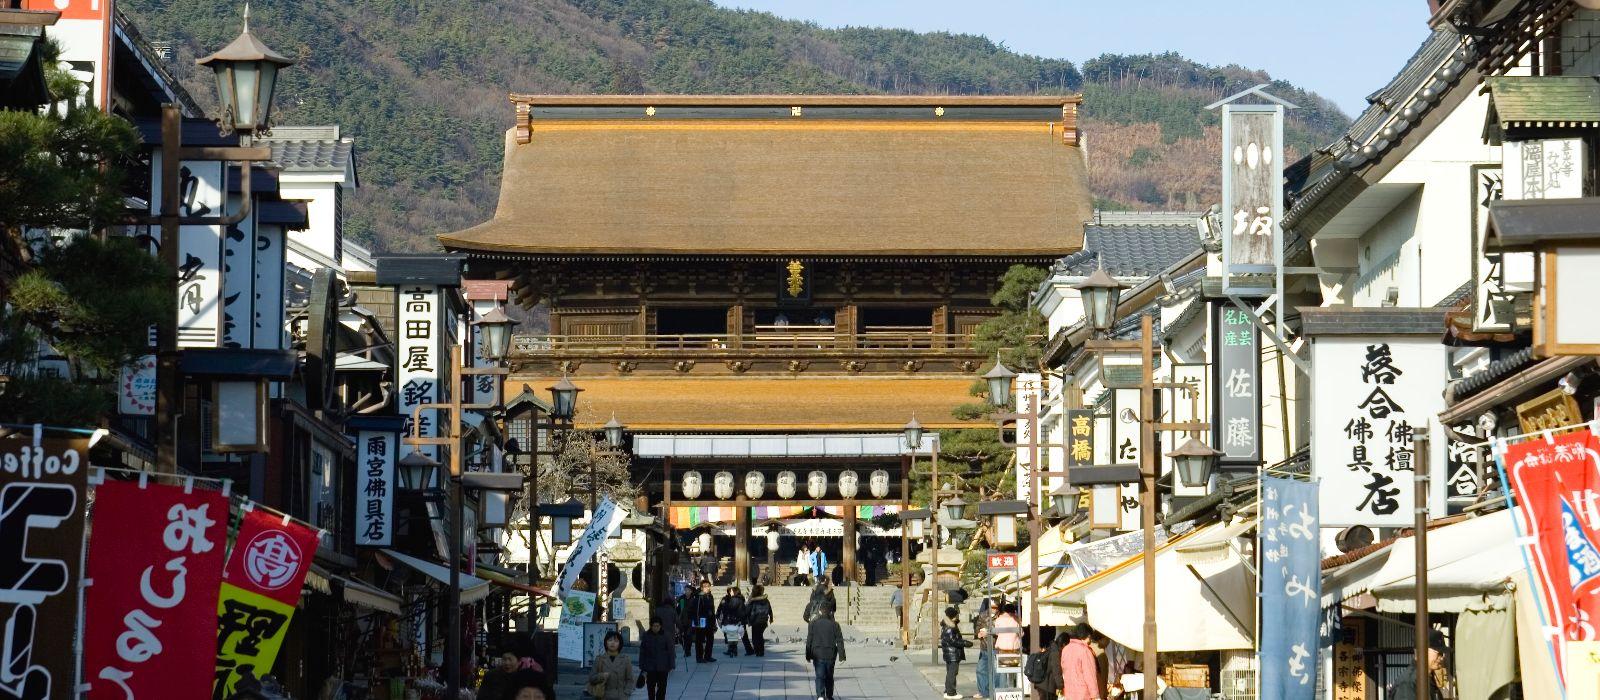 Reiseziel Nagano Japan